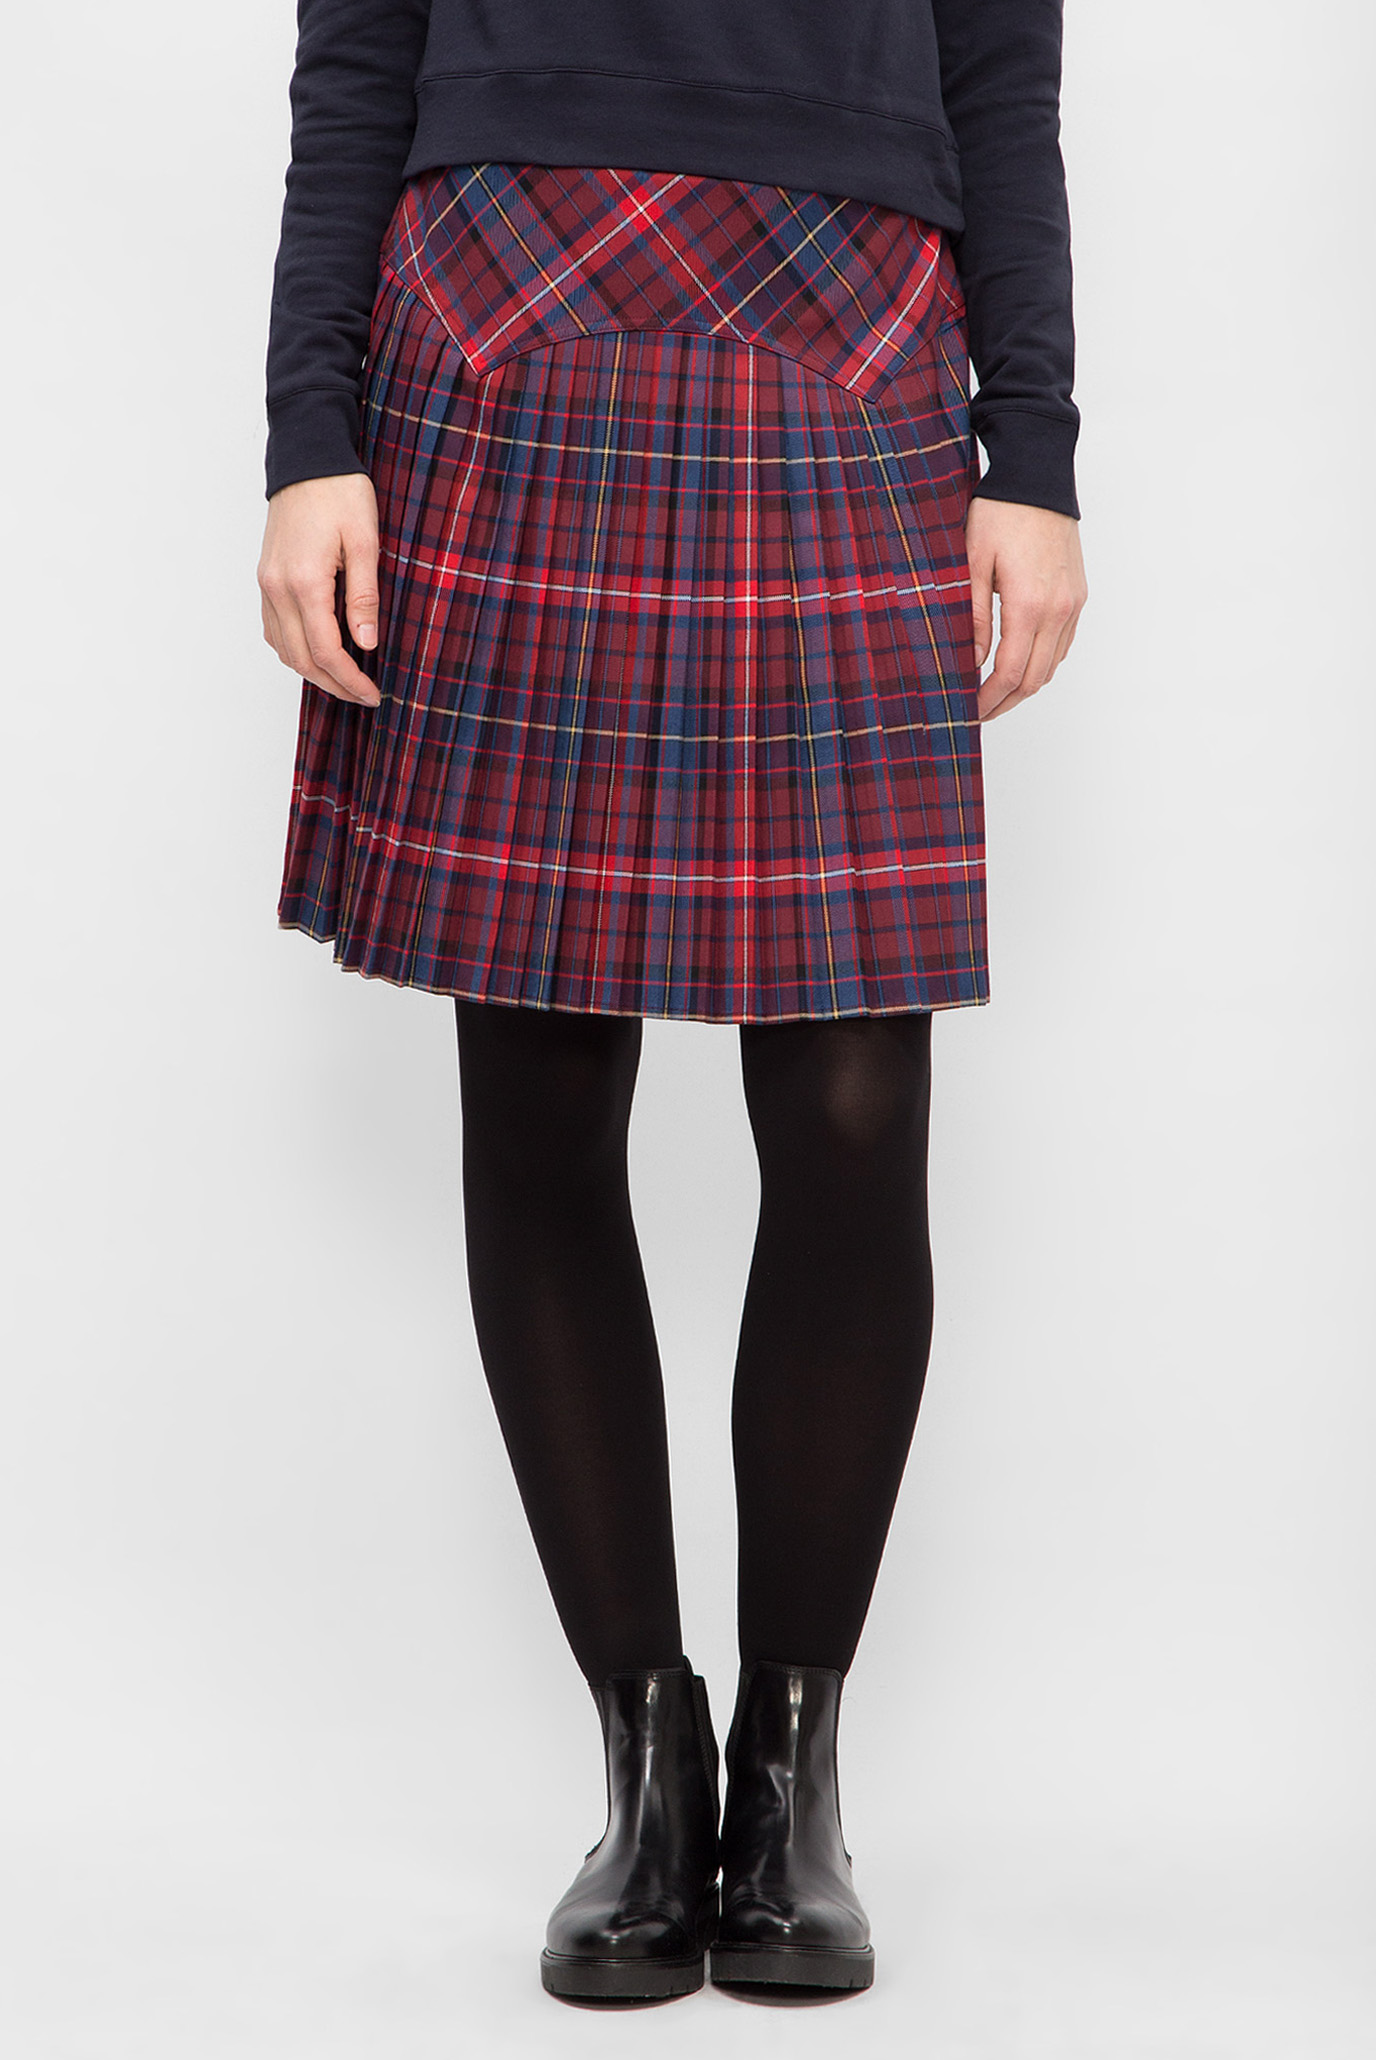 e4c9bea5457 Купить Женская юбка в клетку Tommy Hilfiger Tommy Hilfiger WW0WW19866 –  Киев